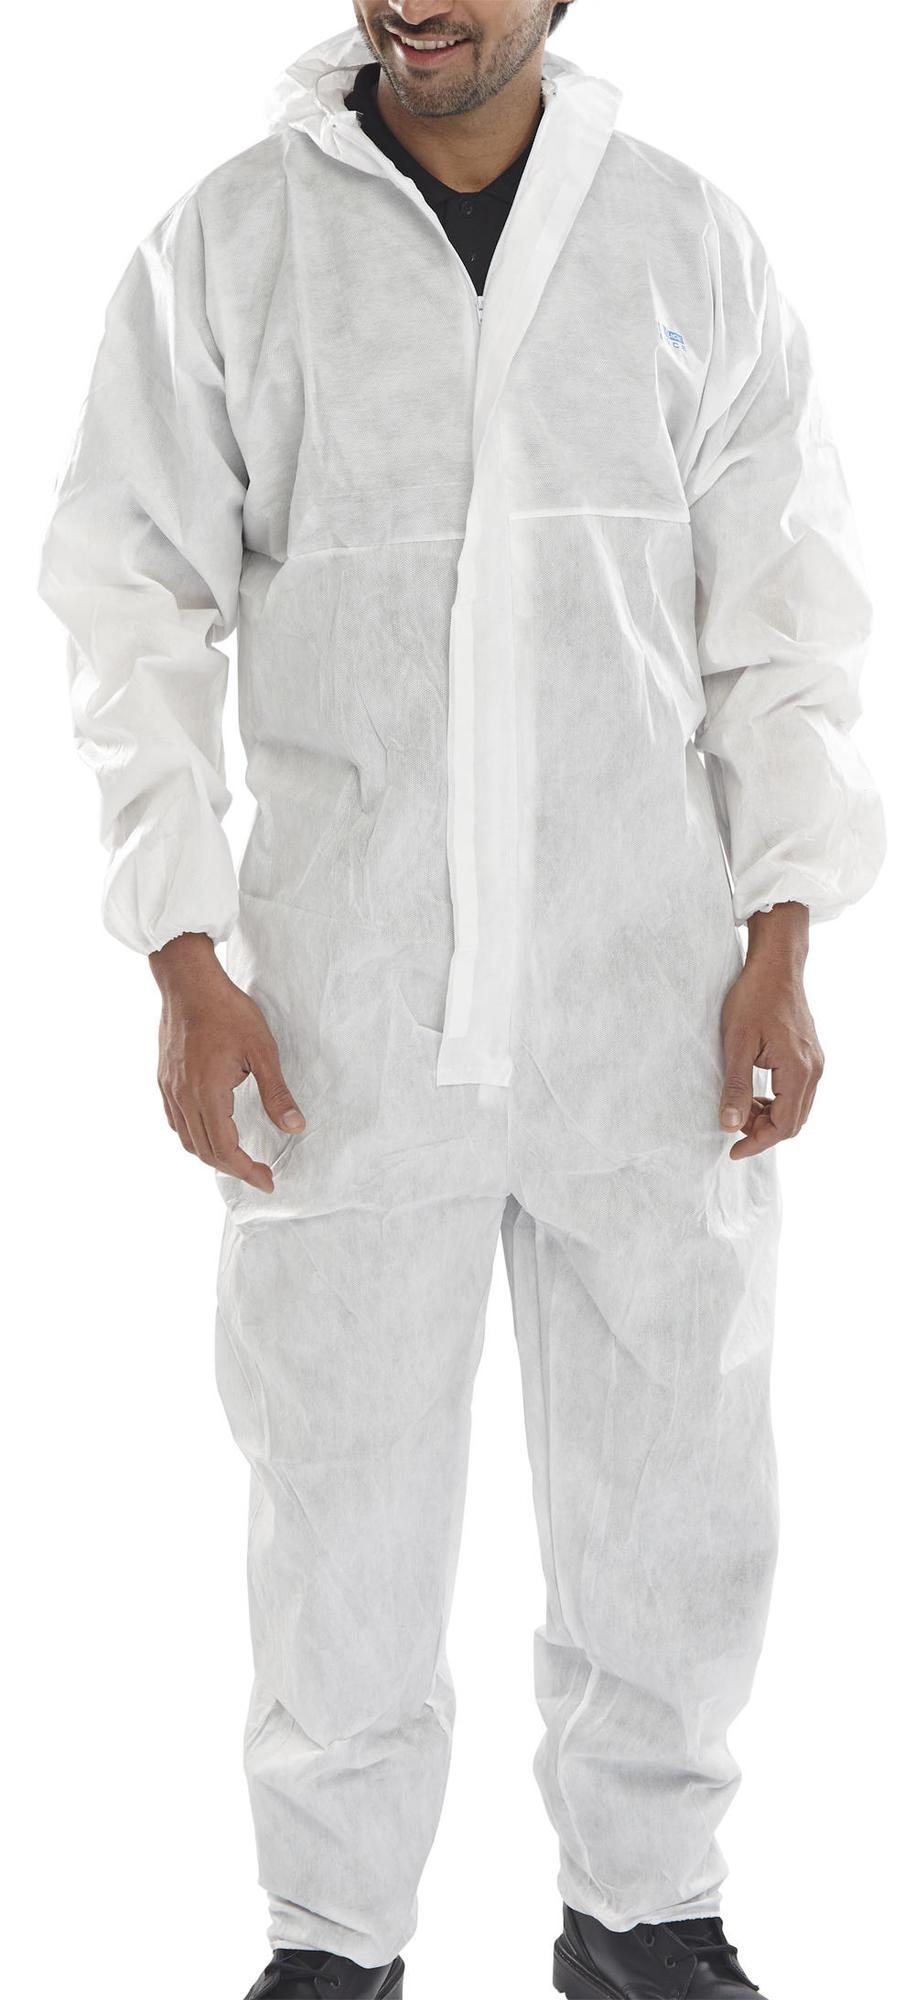 Disposable Boilersuit Type 5/6